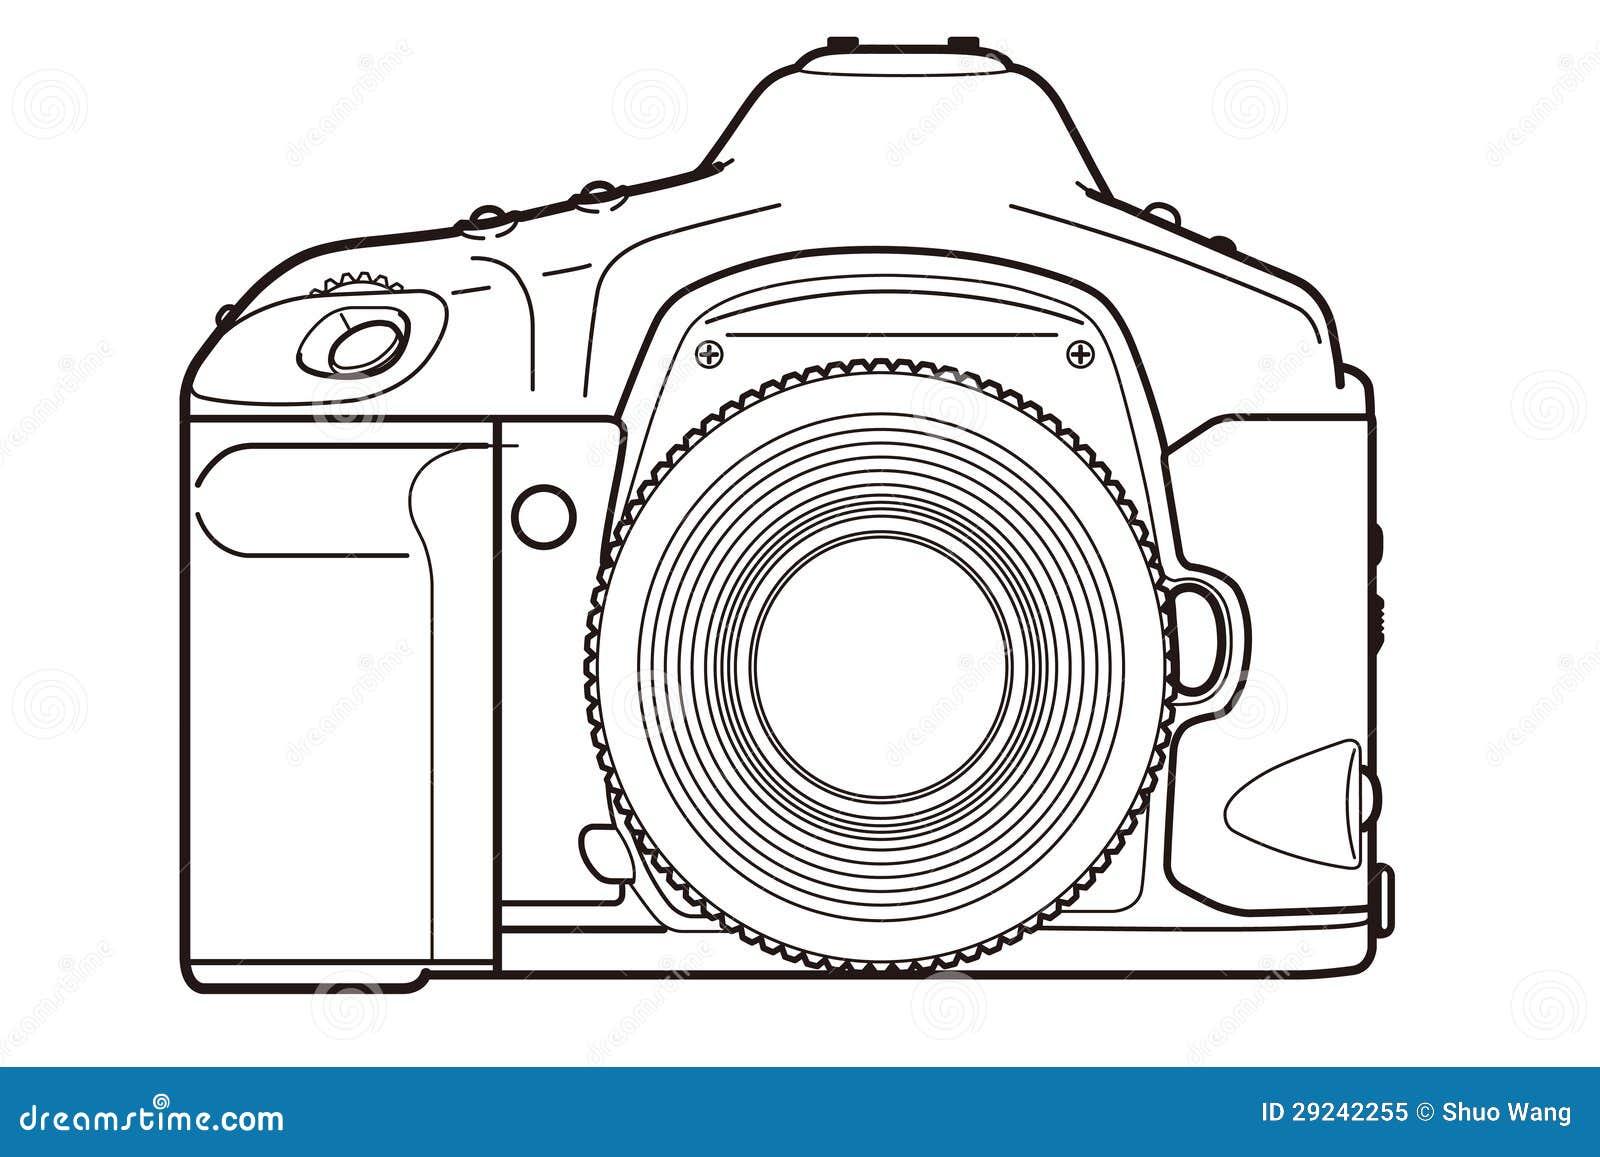 free clipart slr camera - photo #27